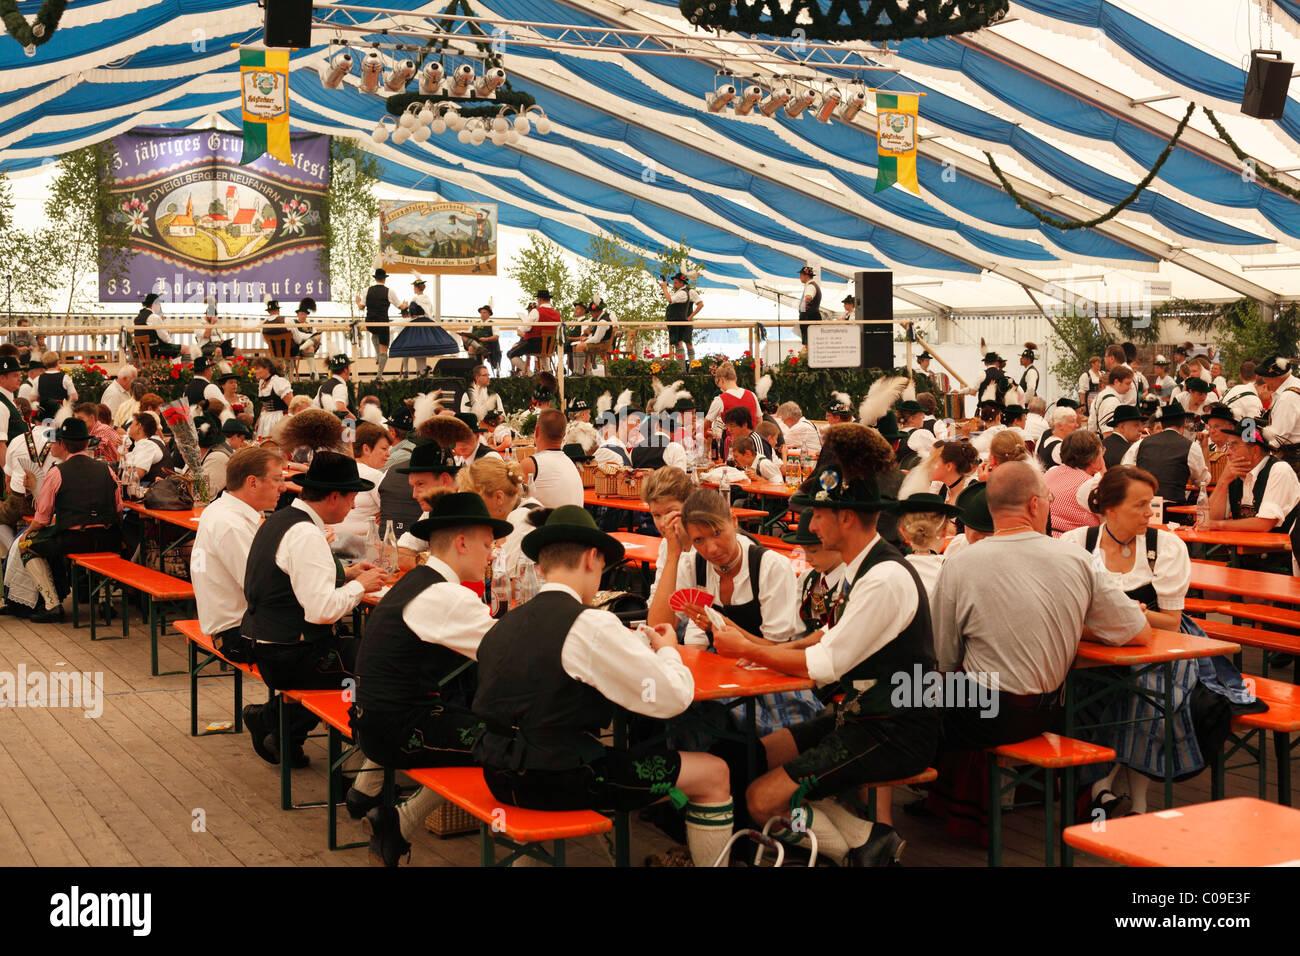 Festival tent, marquee, 83rd Loisachgaufest in Neufahrn near Egling, Upper Bavaria, Bavaria, Germany, Europe - Stock Image